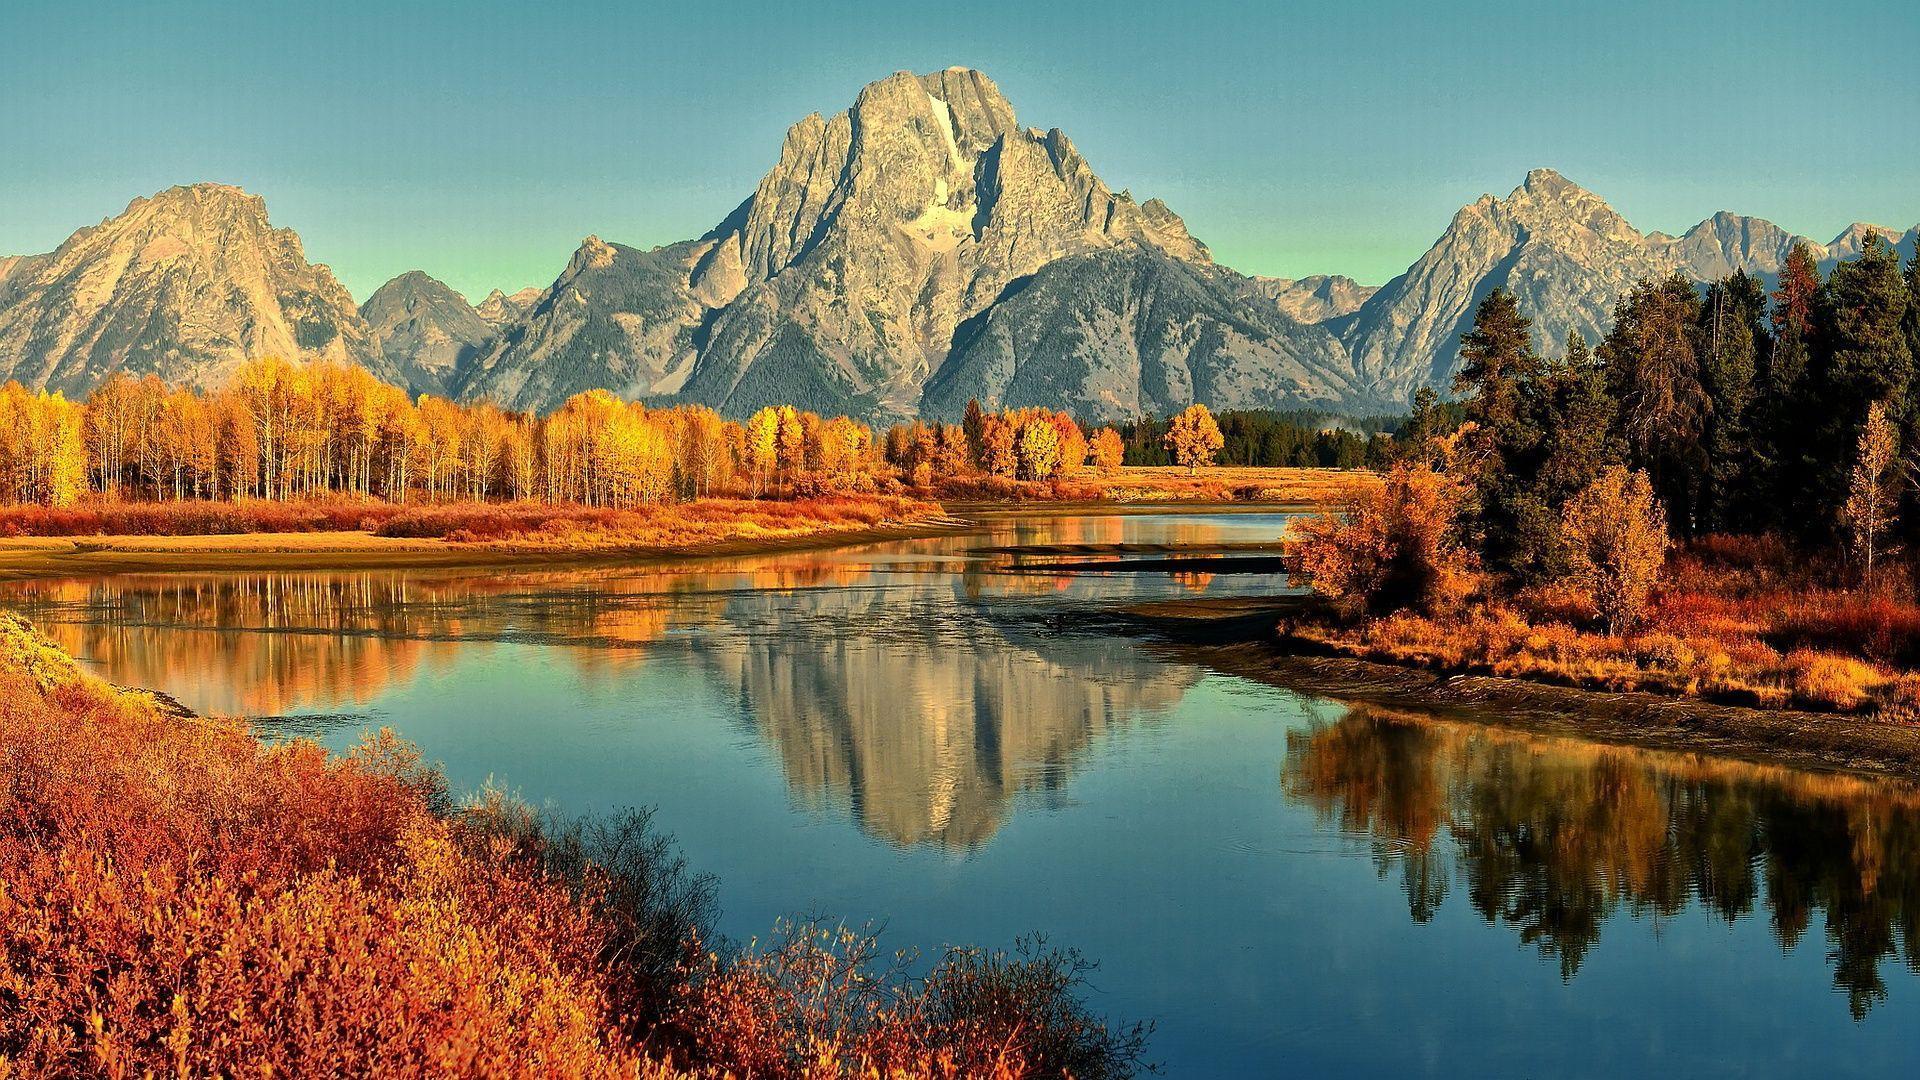 Autumn Mountain Wallpapers Top Free Autumn Mountain Backgrounds Wallpaperaccess